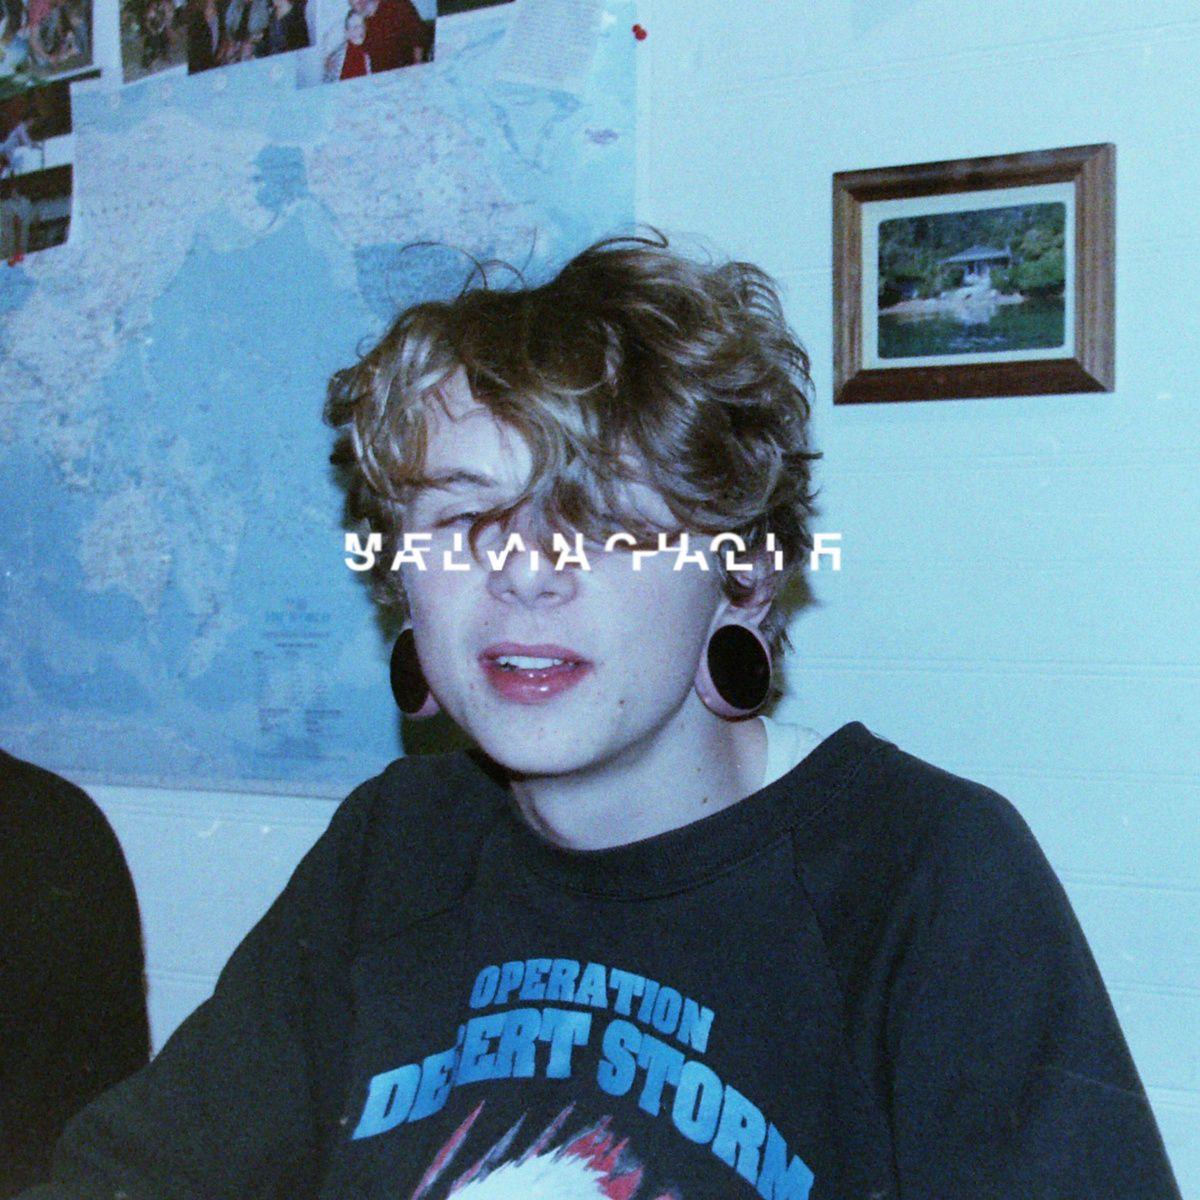 Melancholie - Salvia Palth